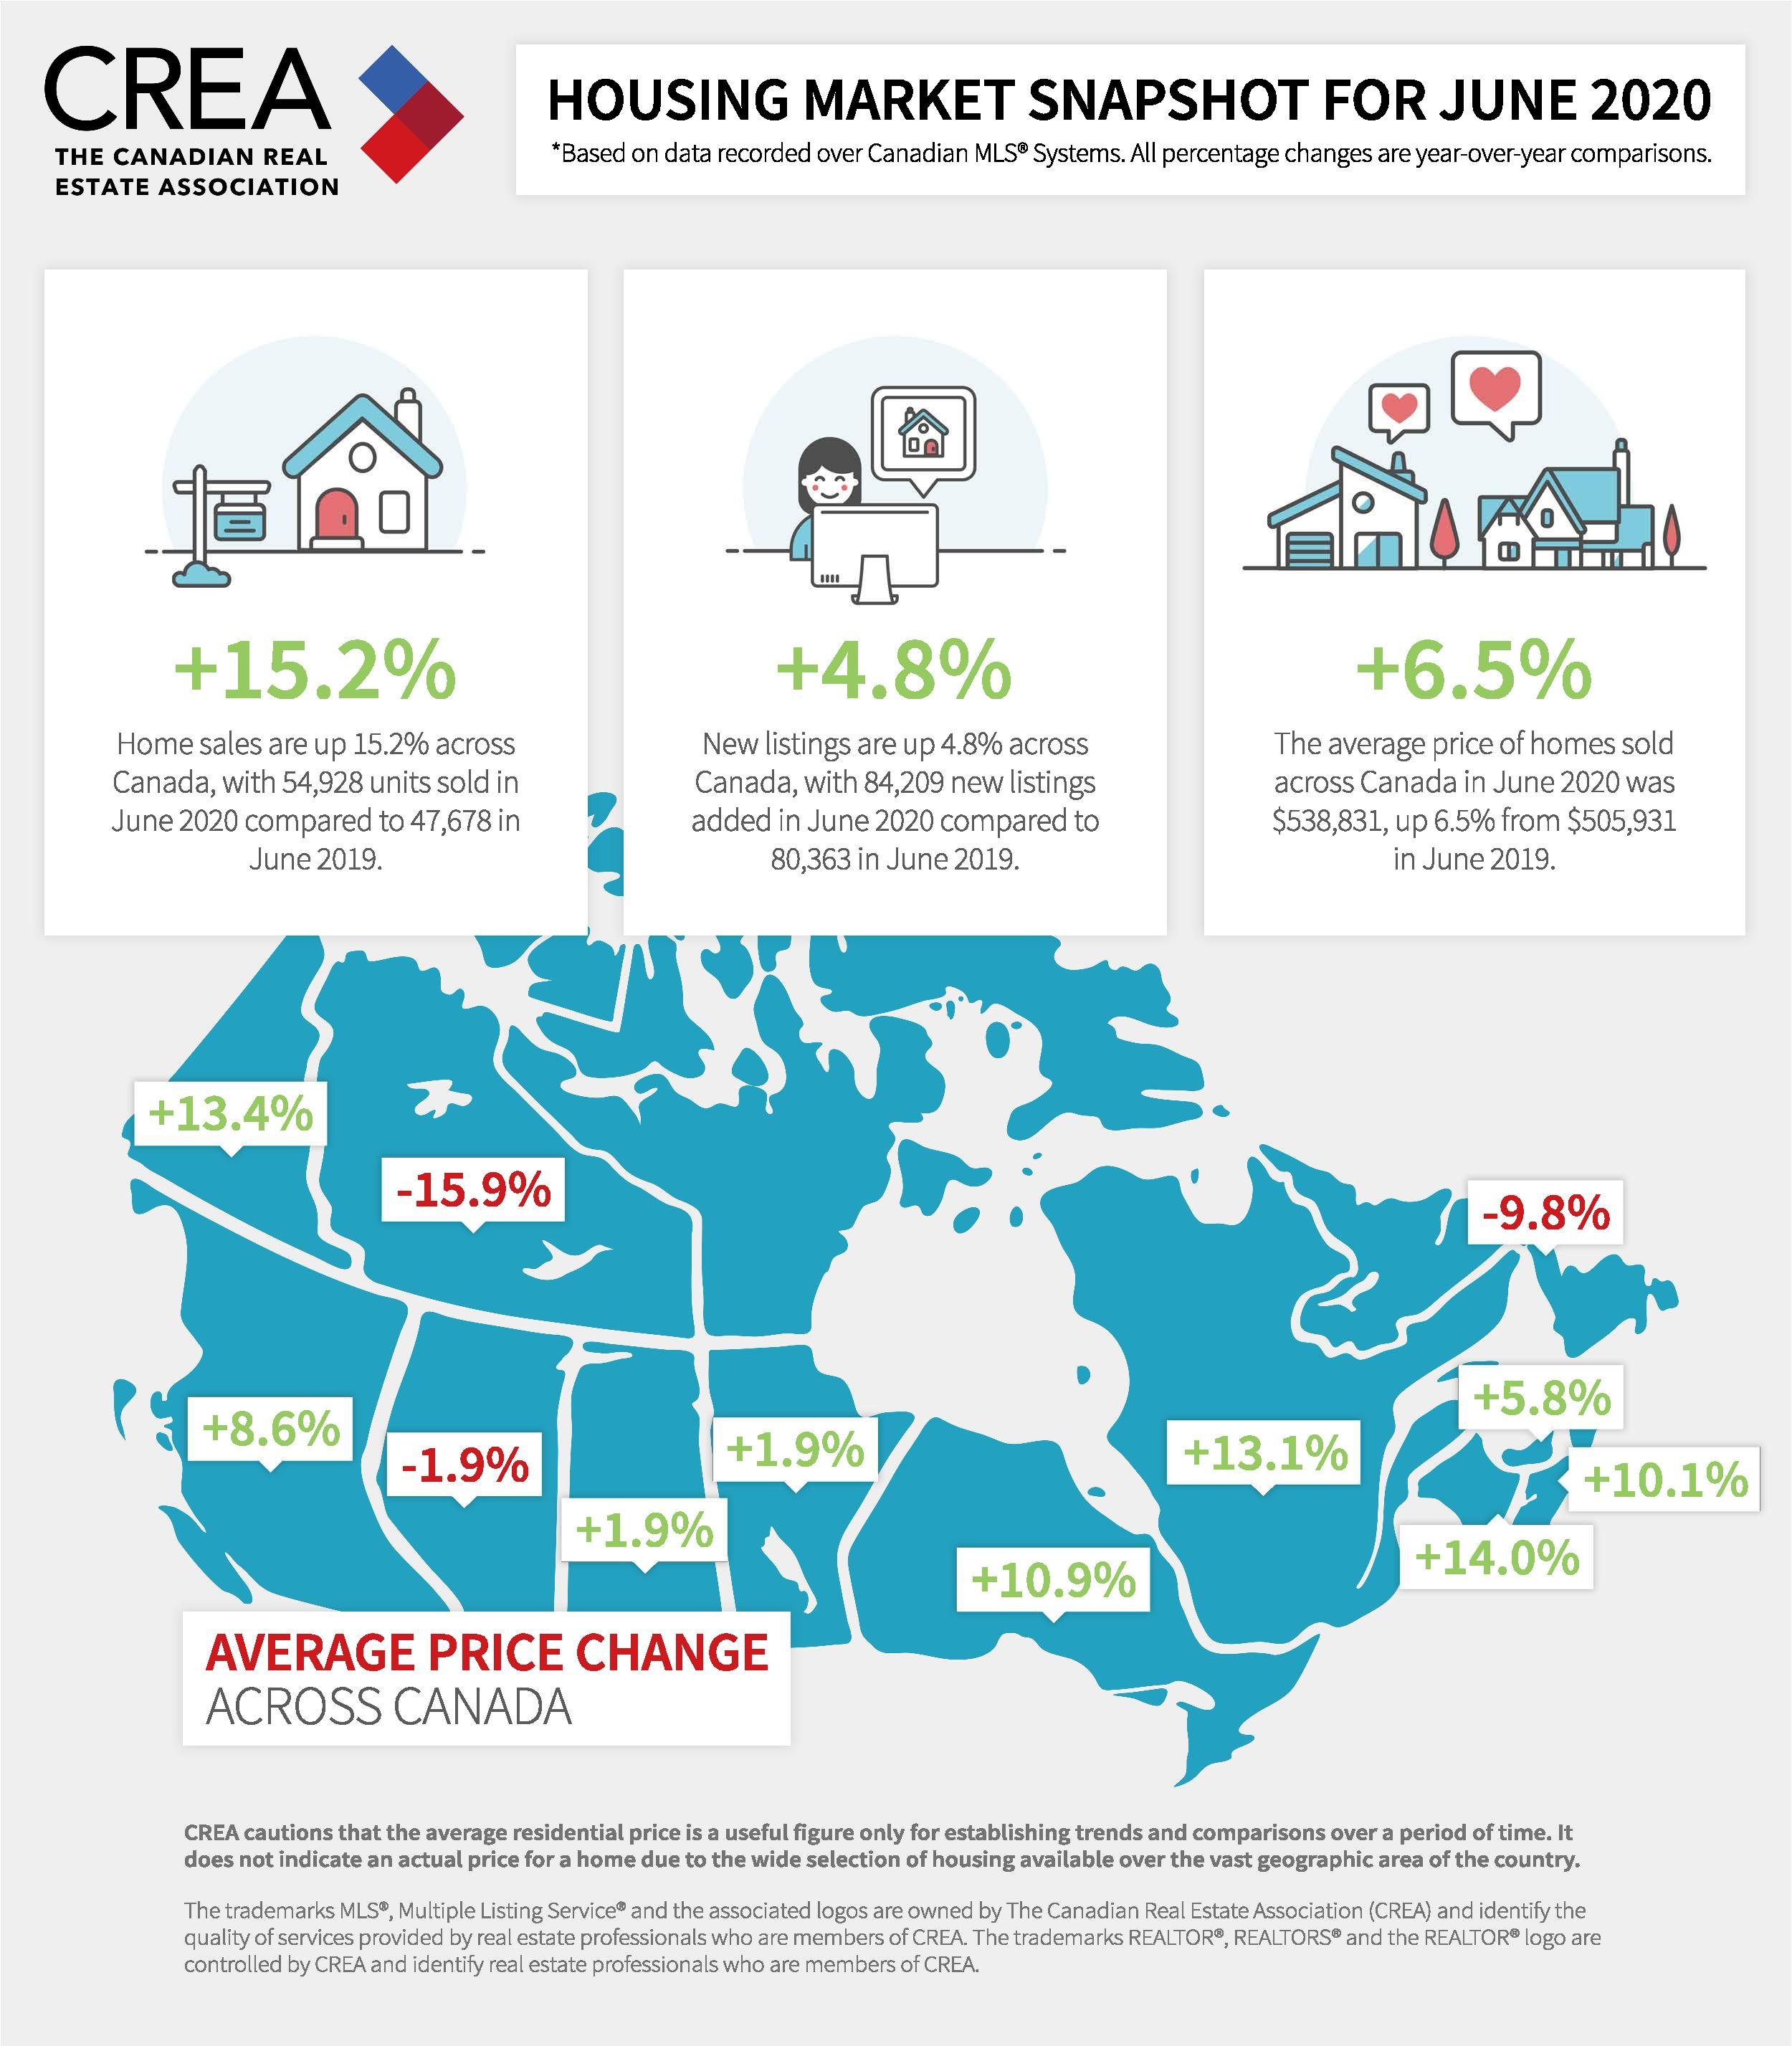 CREA - Housing Market Snapshot June 2020-page-001.jpg